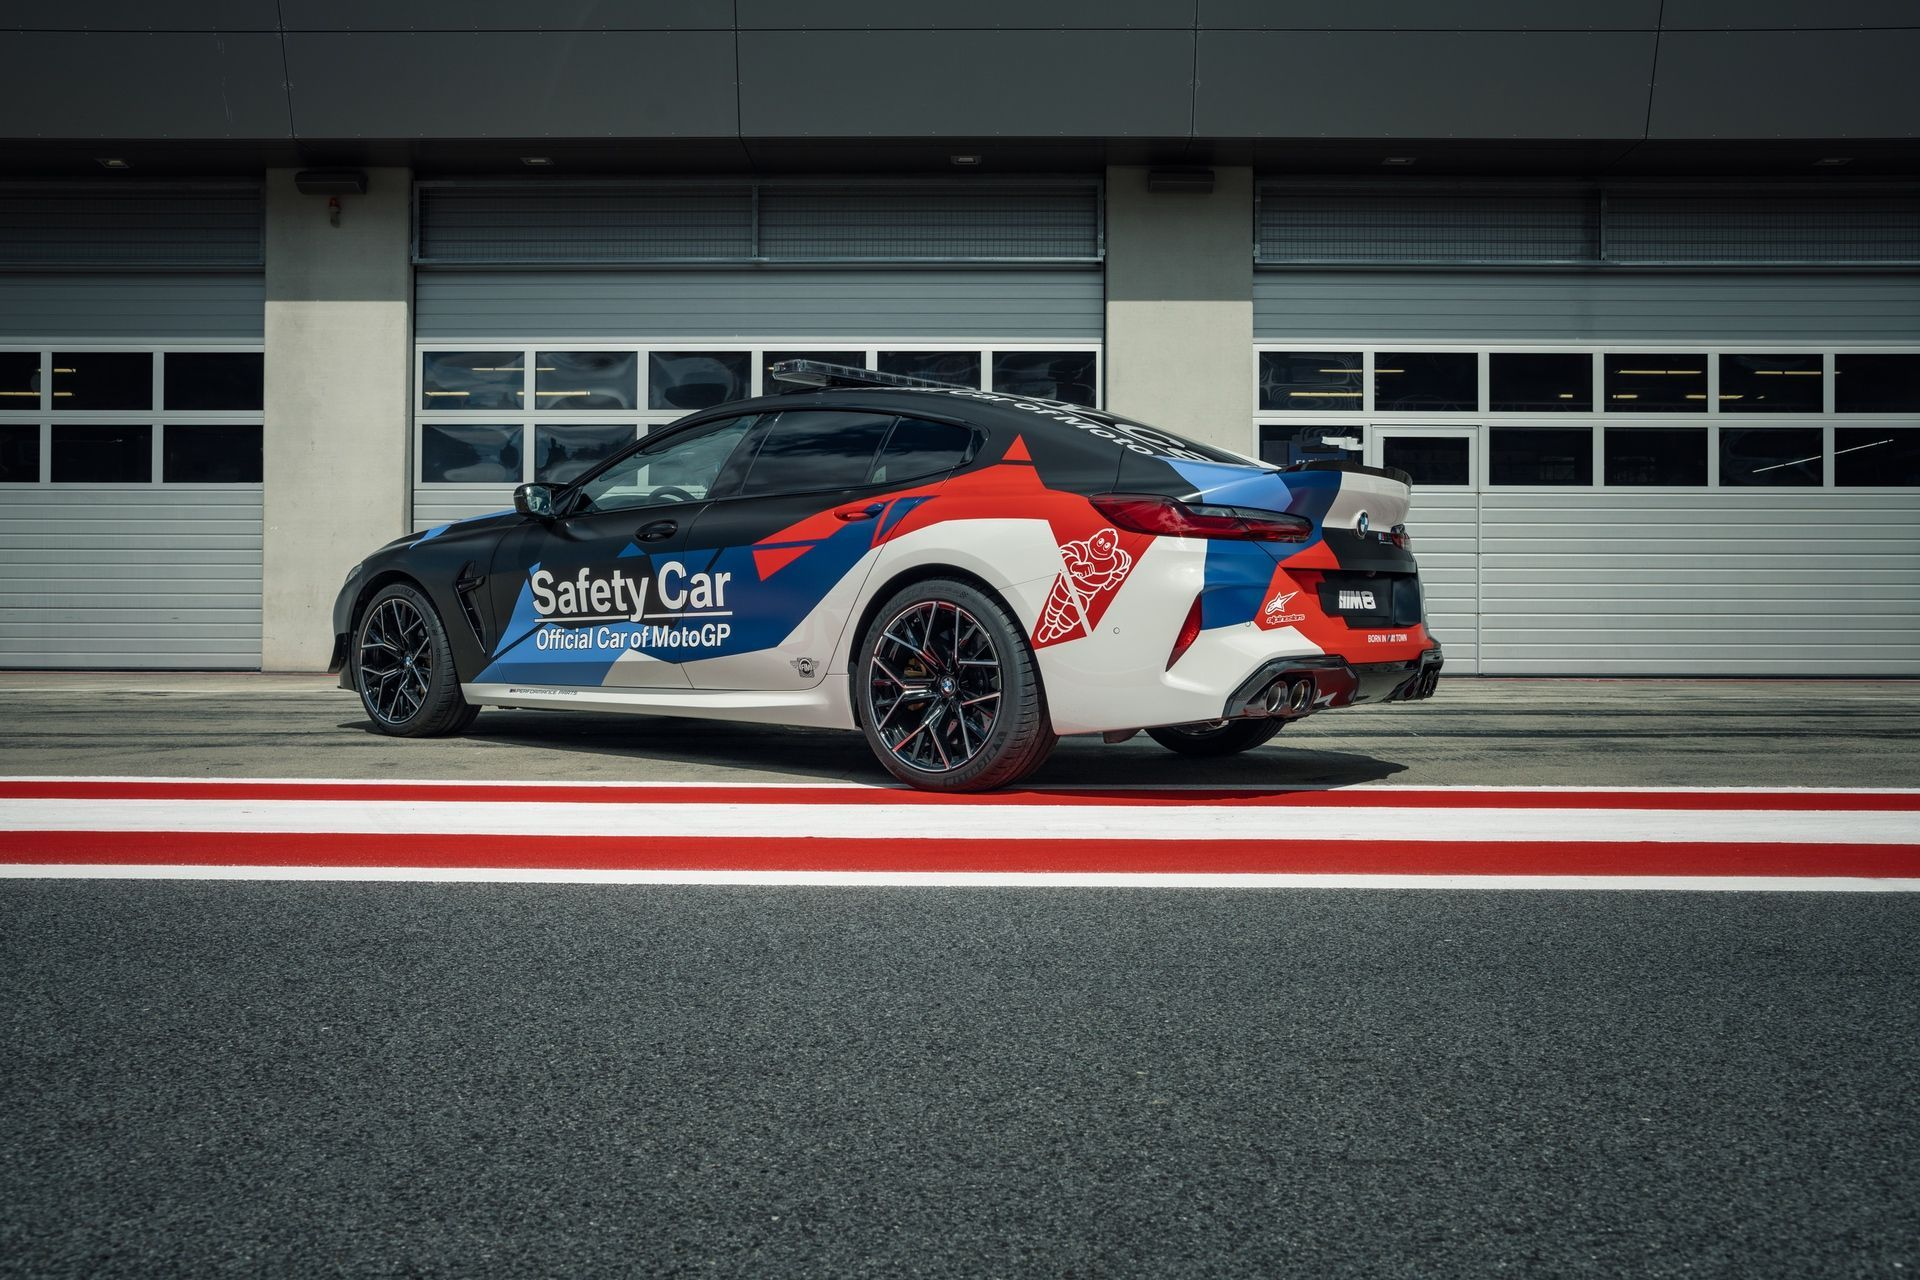 BMW_M8_Gran_Coupe_Safety_Car_MotoGP_0005